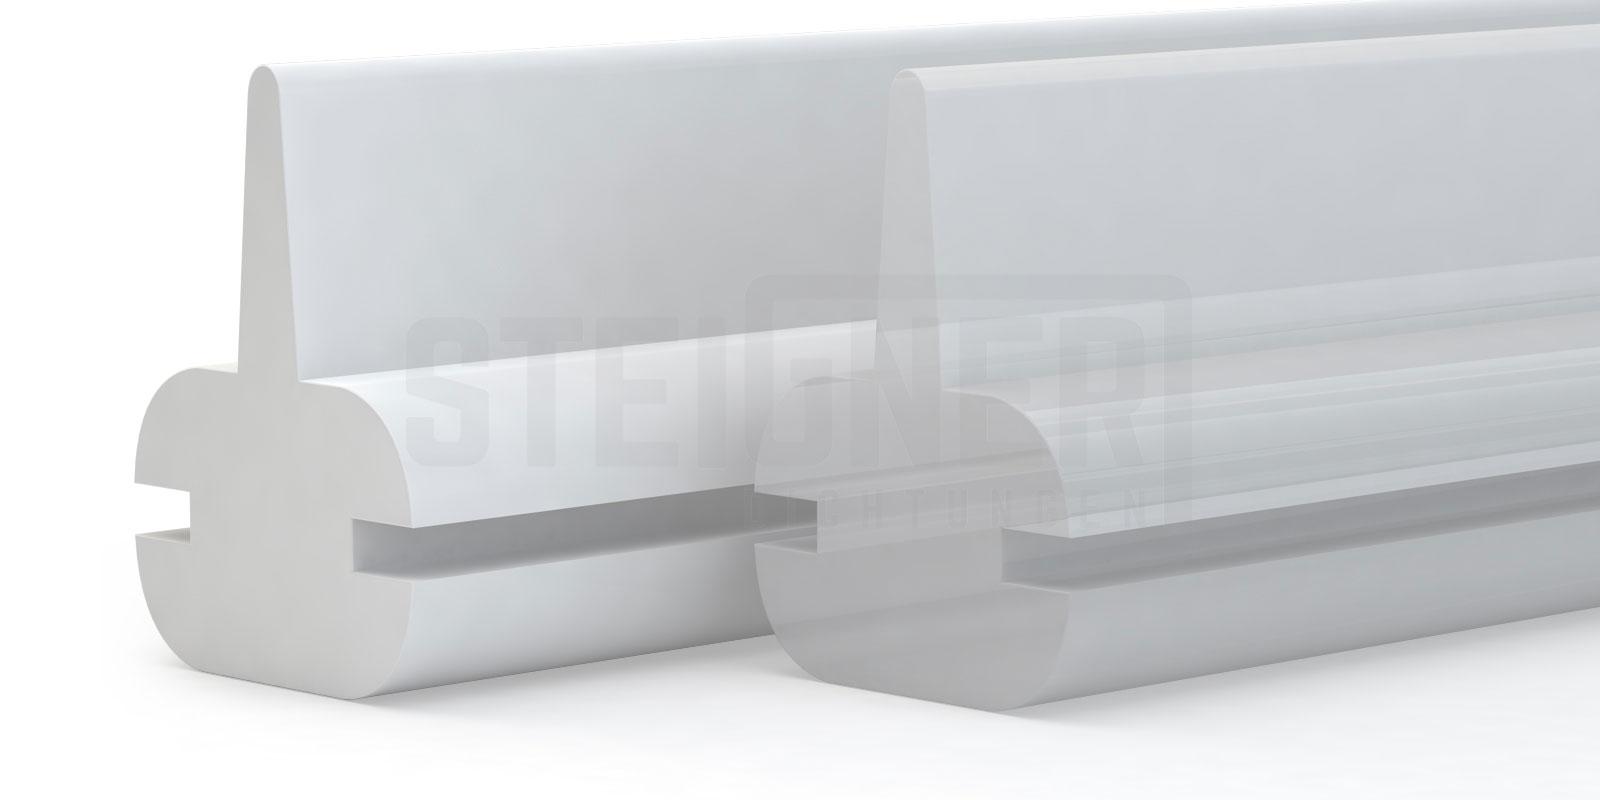 duschdichtung dichtung duschkabine duscht r wasserabweiser. Black Bedroom Furniture Sets. Home Design Ideas